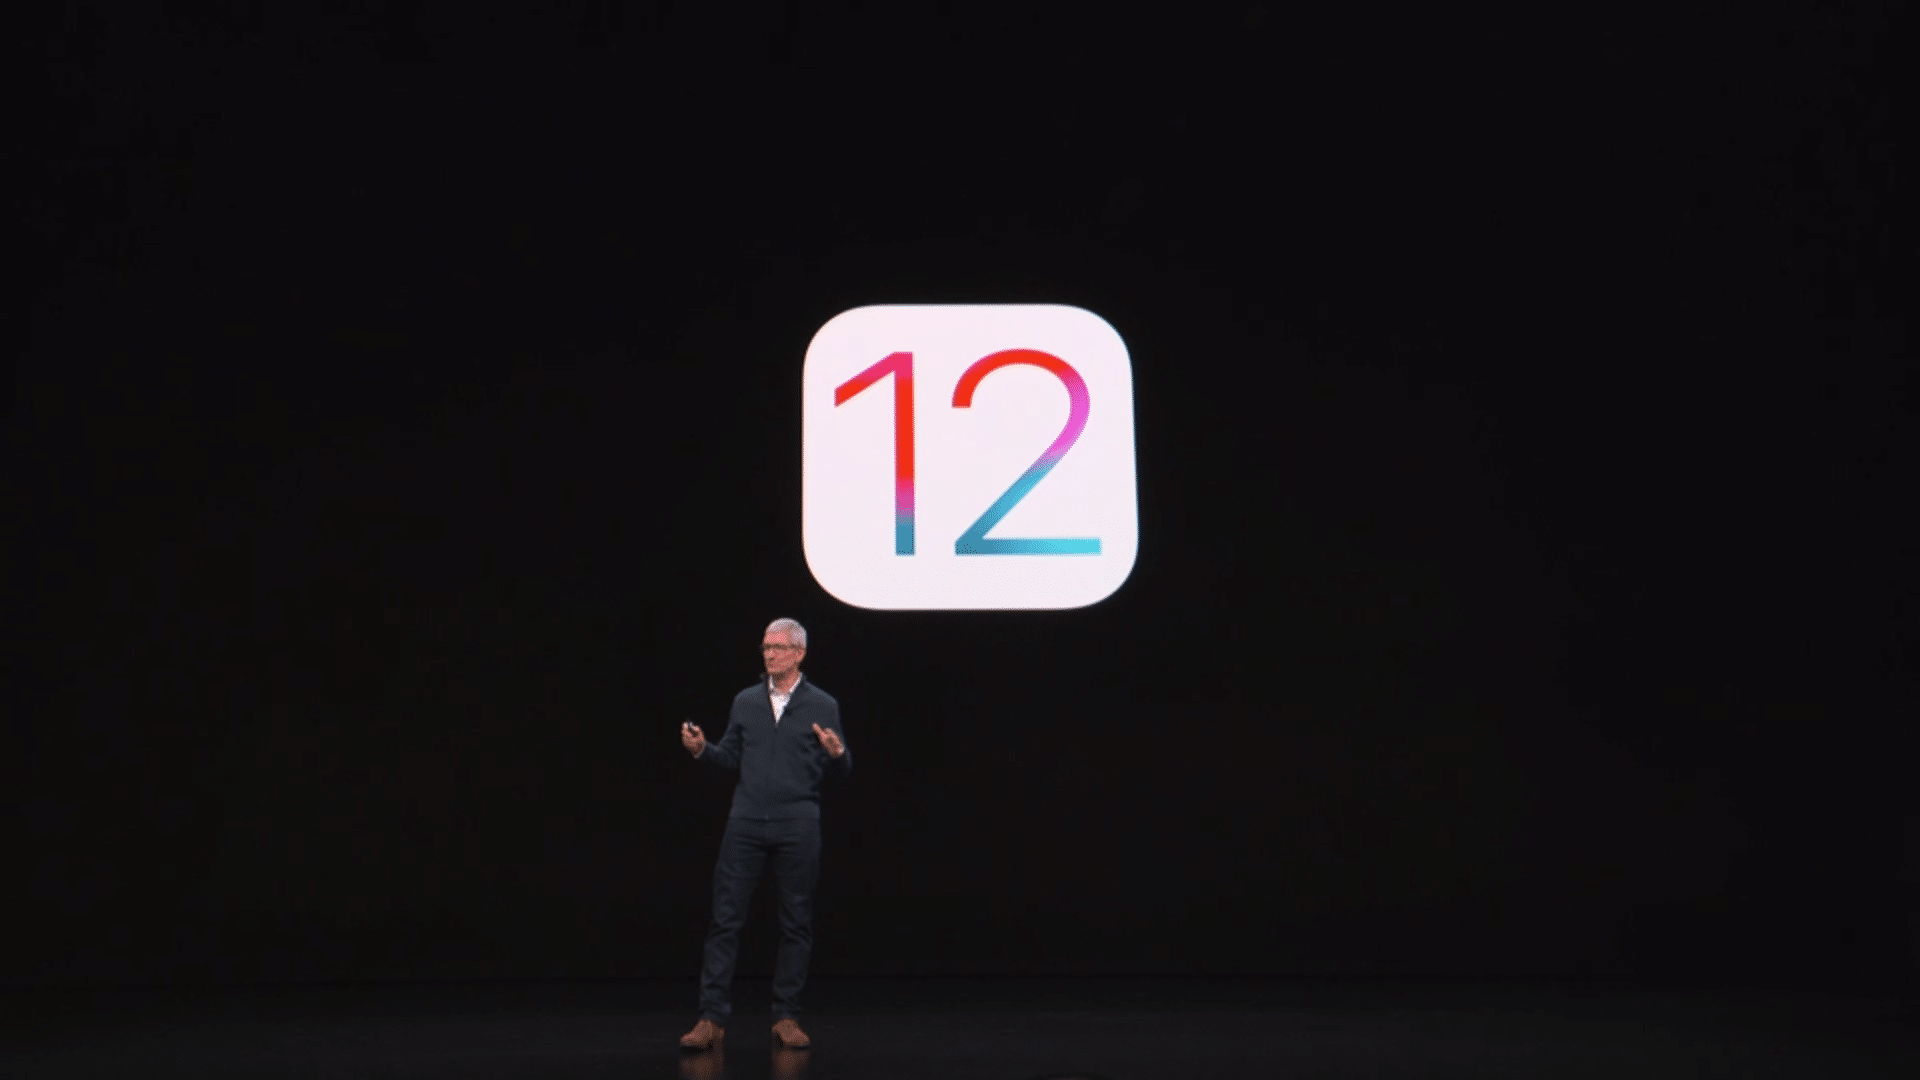 كل ماتريد معرفته عن iPad Pro 2018 8